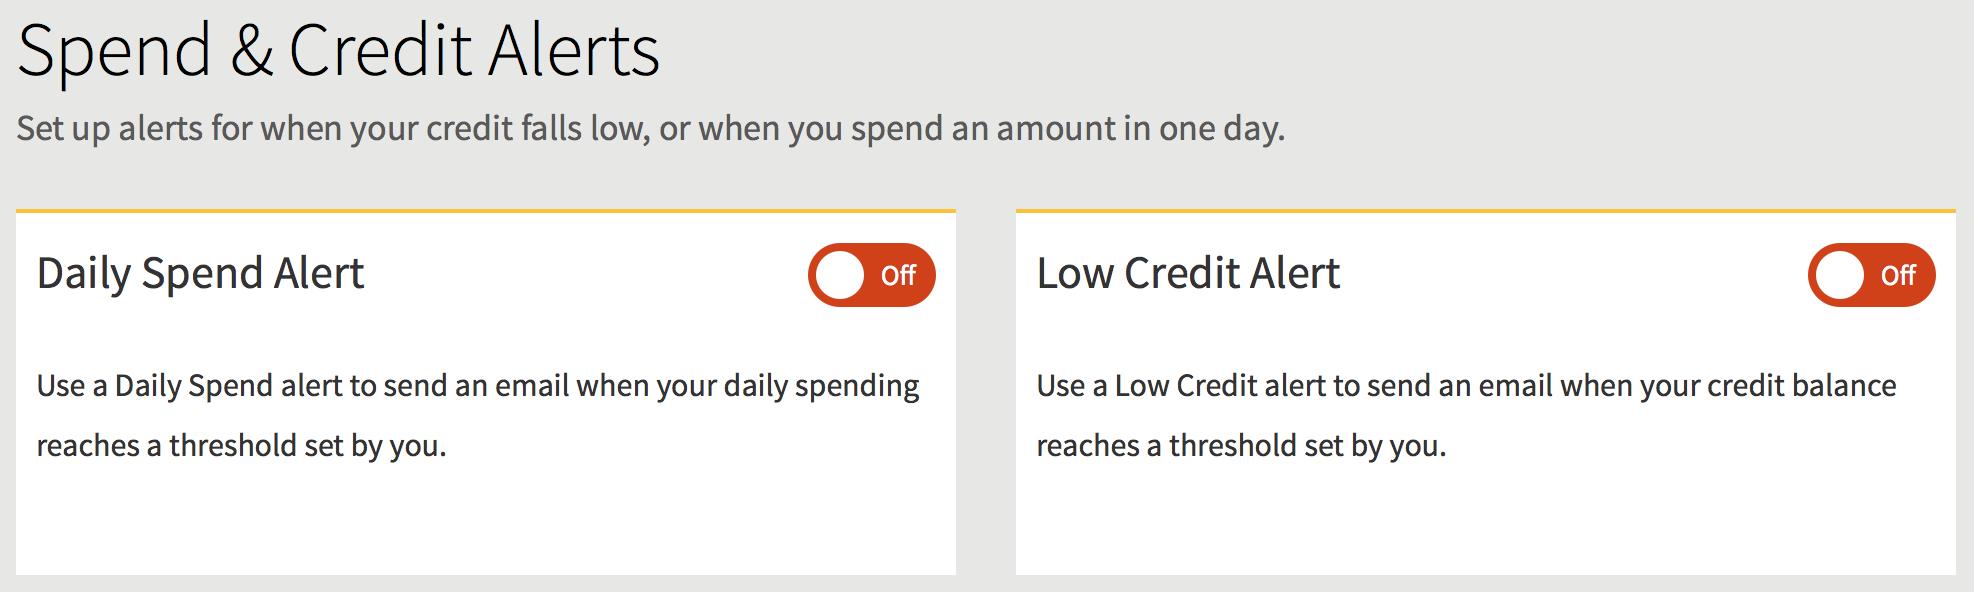 Spend Credit Alerts